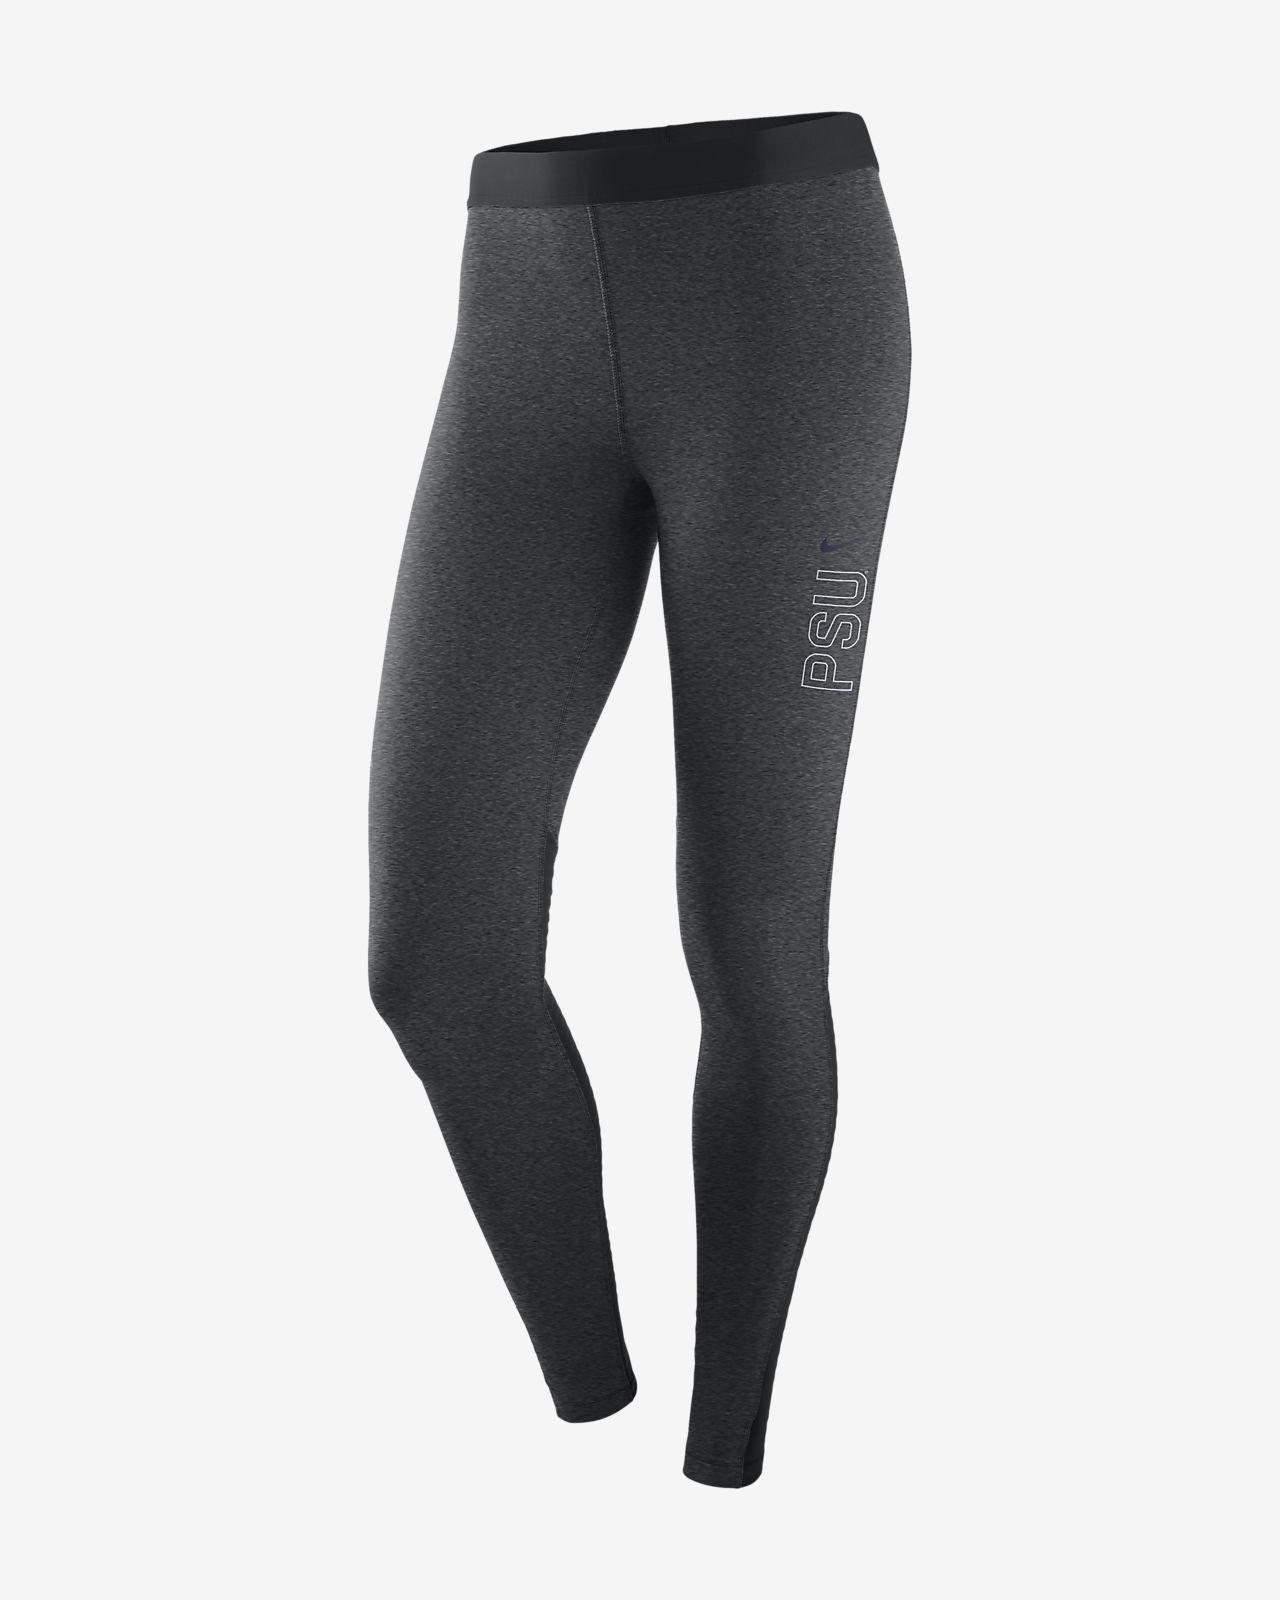 Nike College Pro Warm (Penn State) Women's Tights